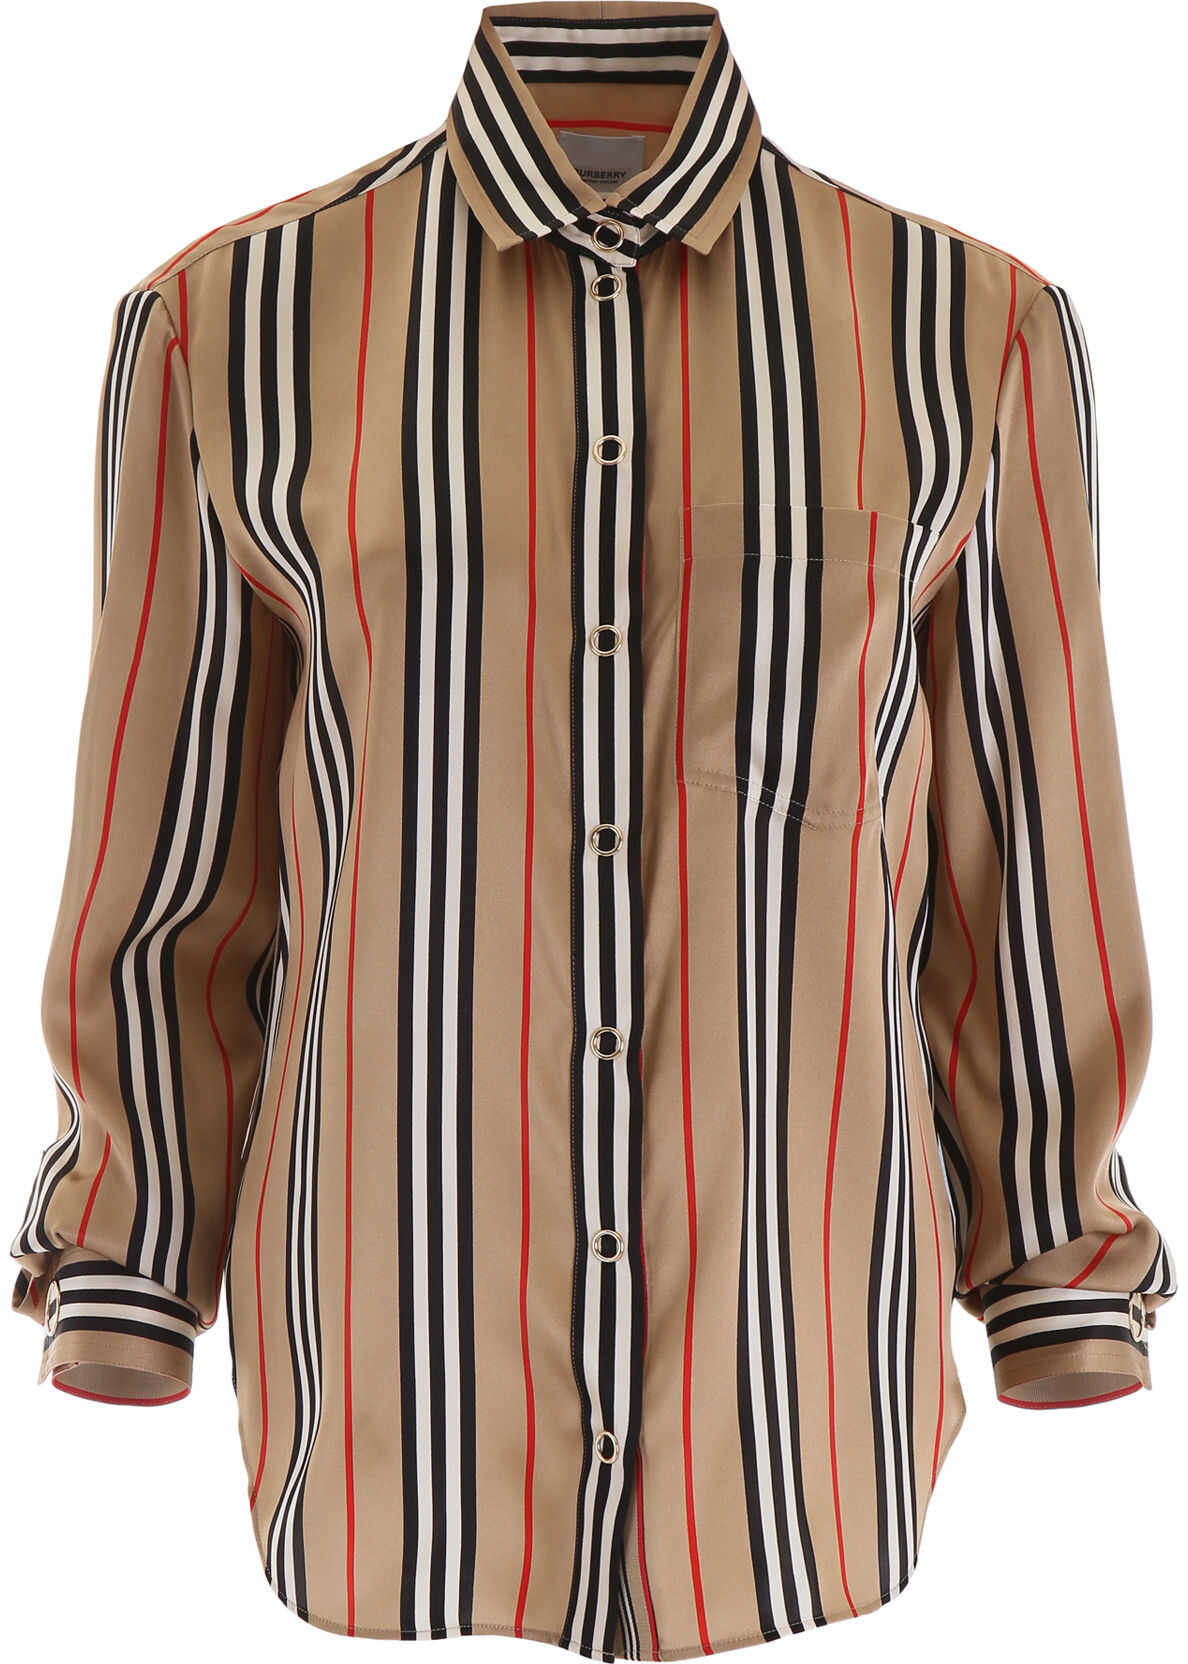 Burberry Striped Silk Shirt ARCHIVE BEIGE IP S